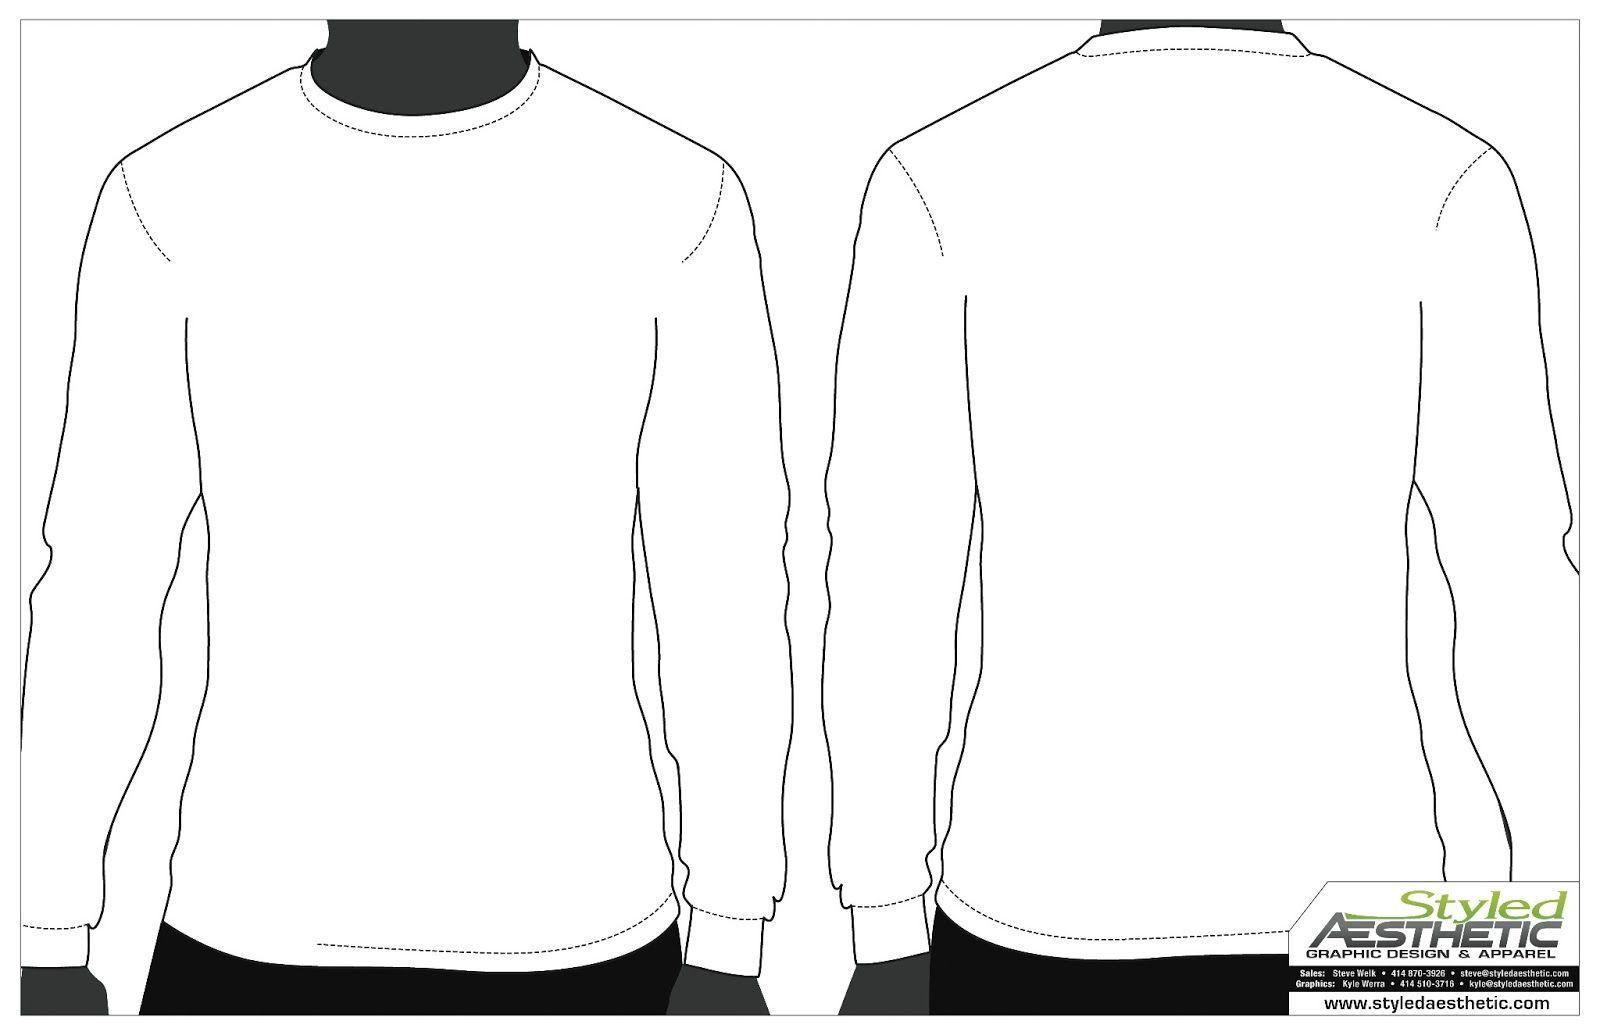 12 Long Sleeve Blank T Shirt Template Psd Images Long With Blank T Shirt Design Template Psd Best T Shirt Design Template Blank T Shirts Long Sleeve Shirts